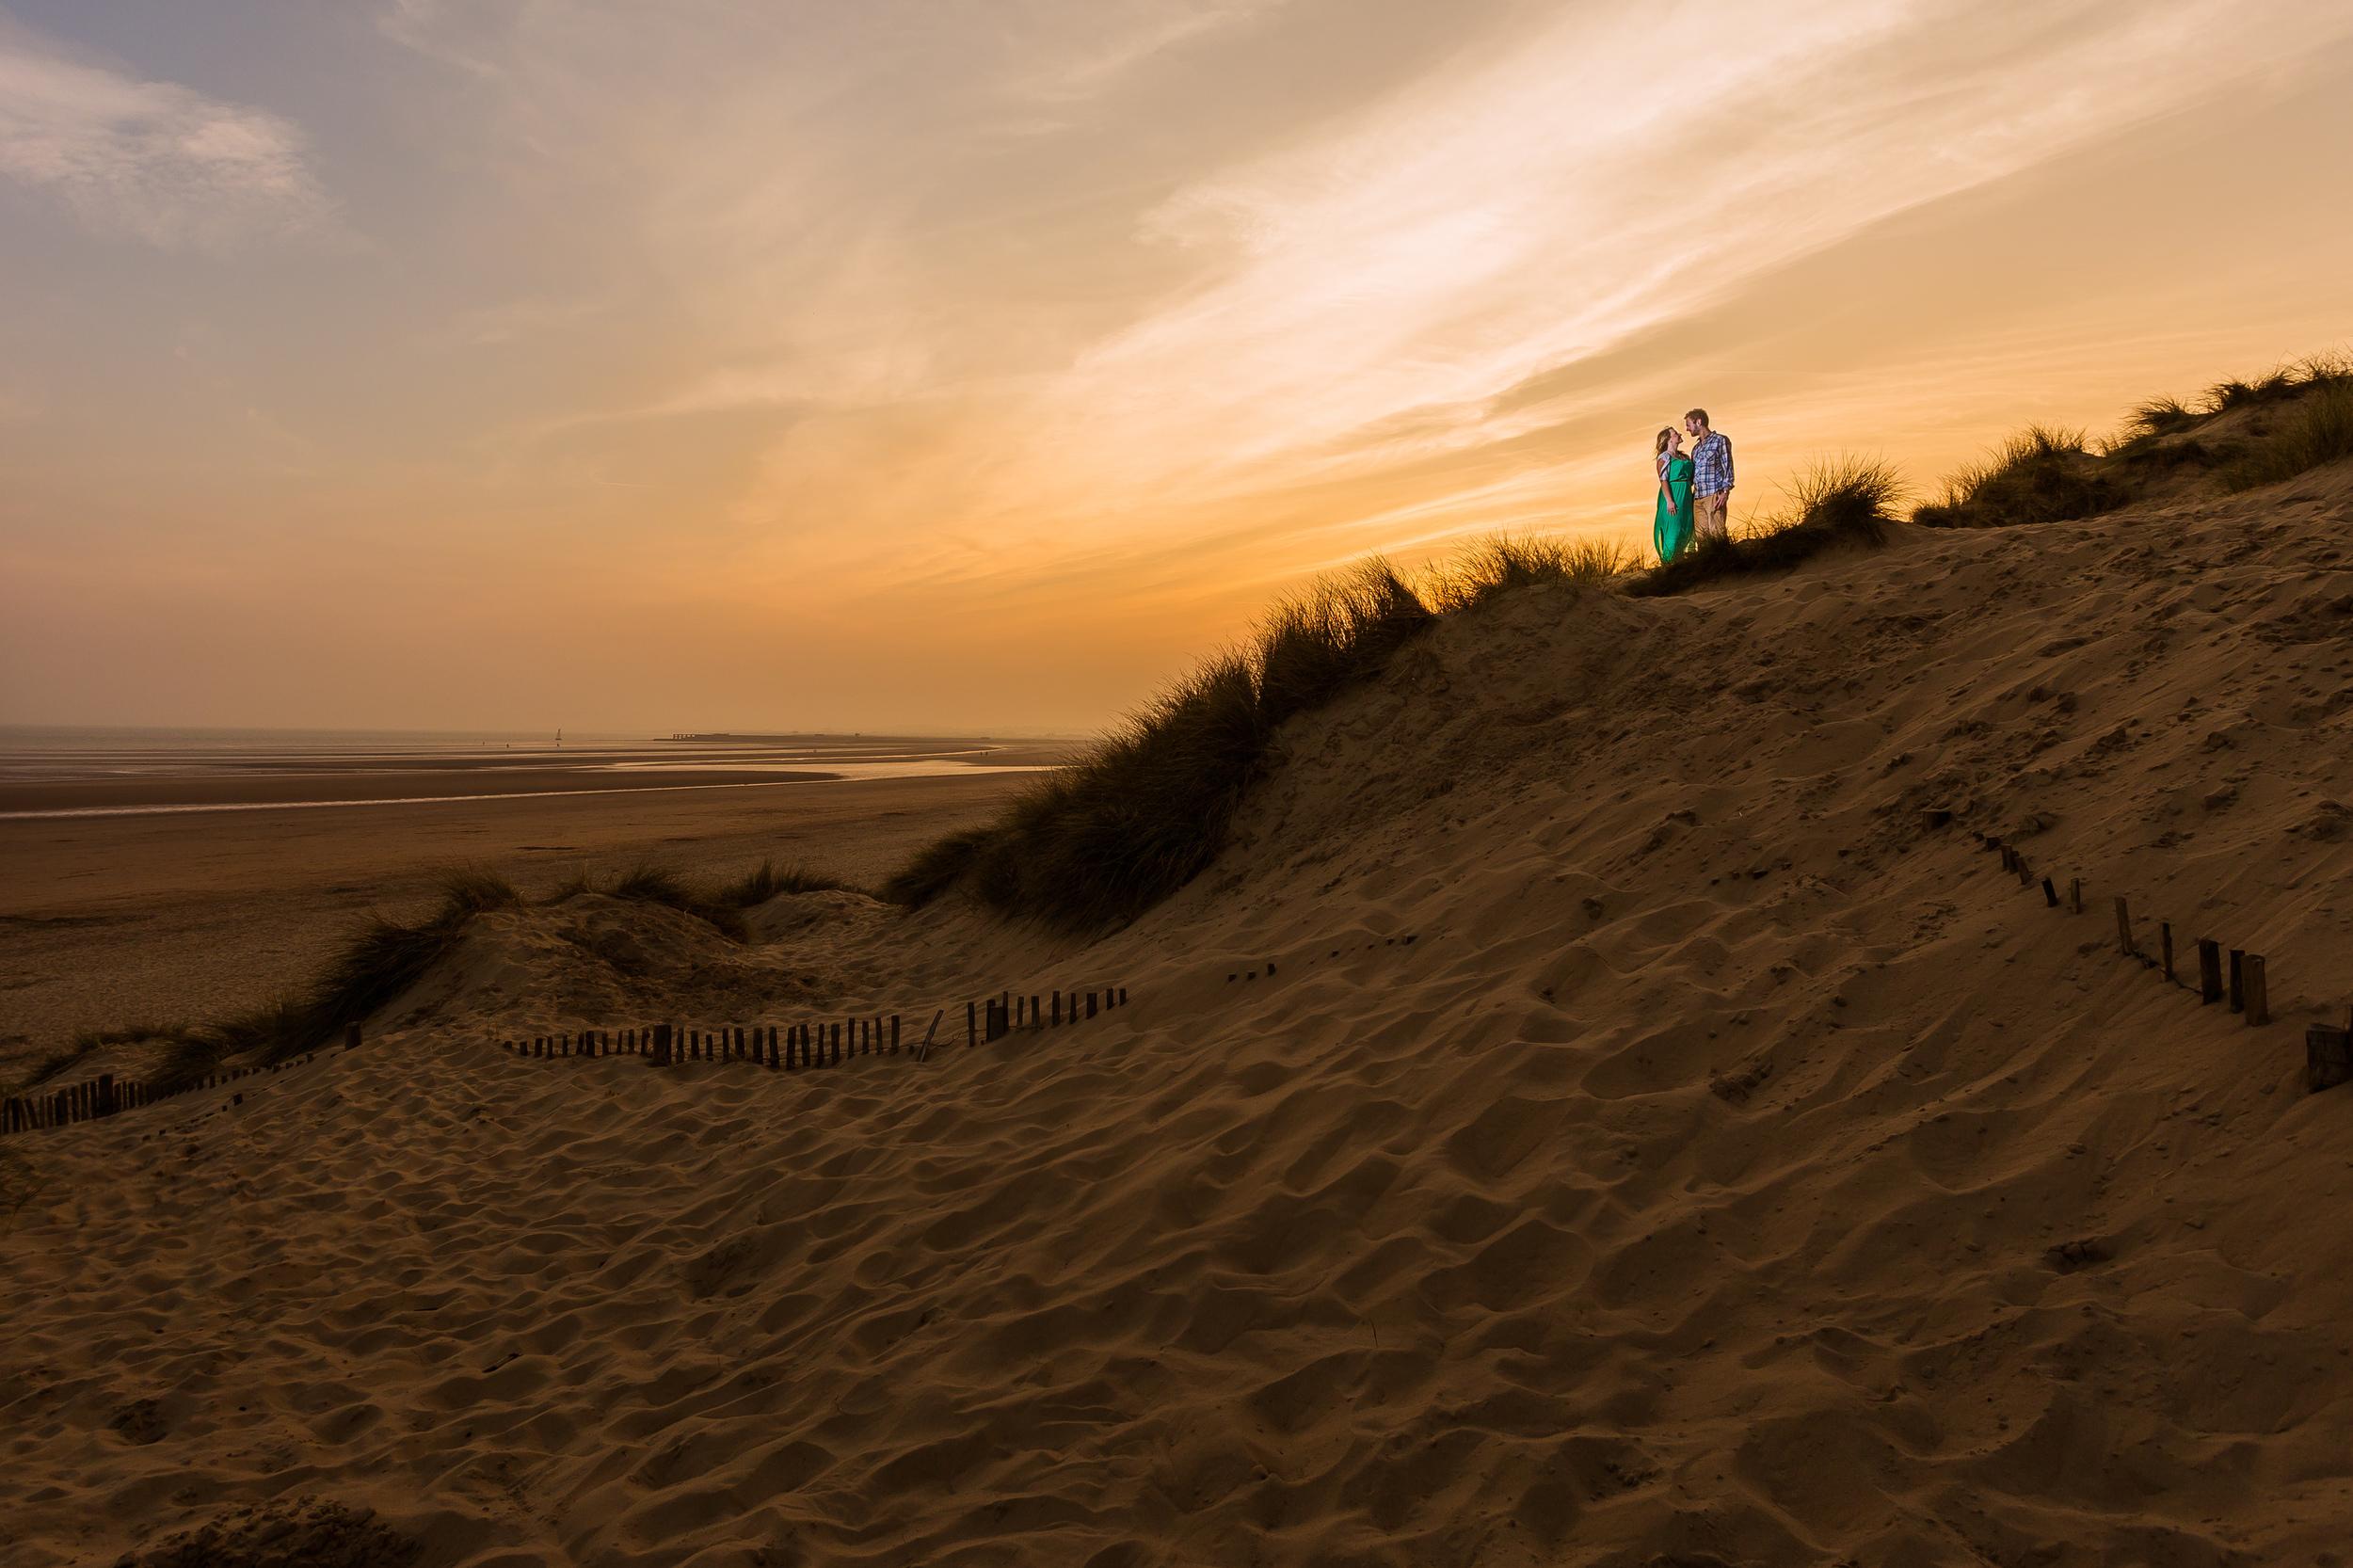 Kent - Engagement - Camber Sands - Beach Shoot - Epic Sunset Photo